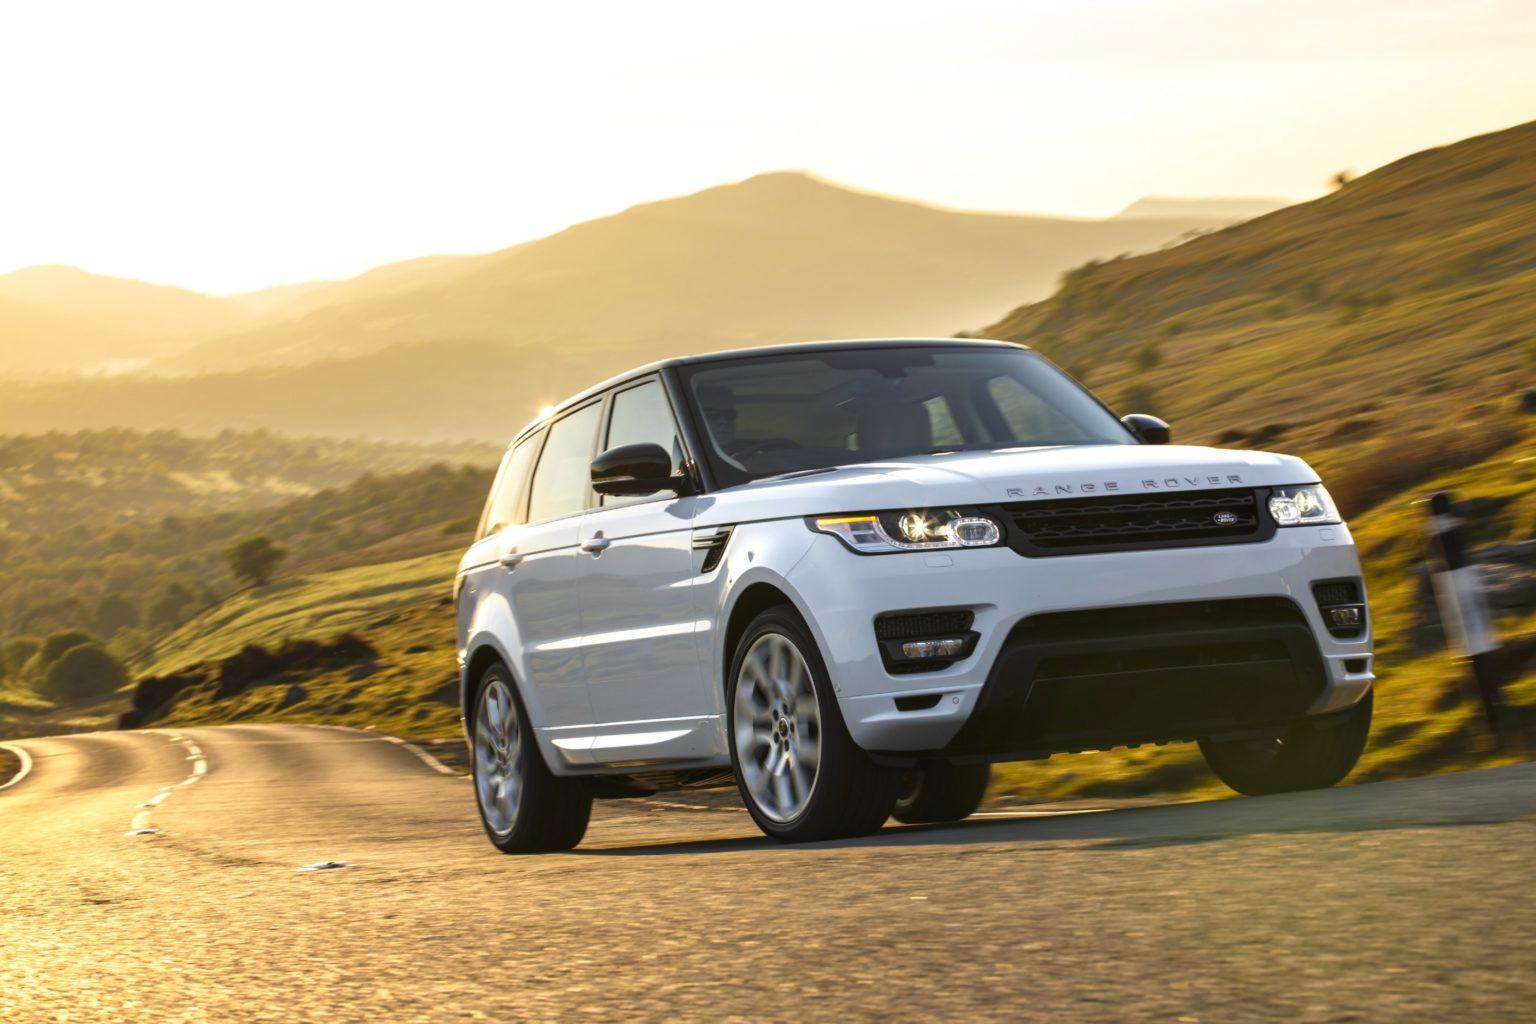 Jaguar F-TYPE a Range Rover Sport bodují! - First Style